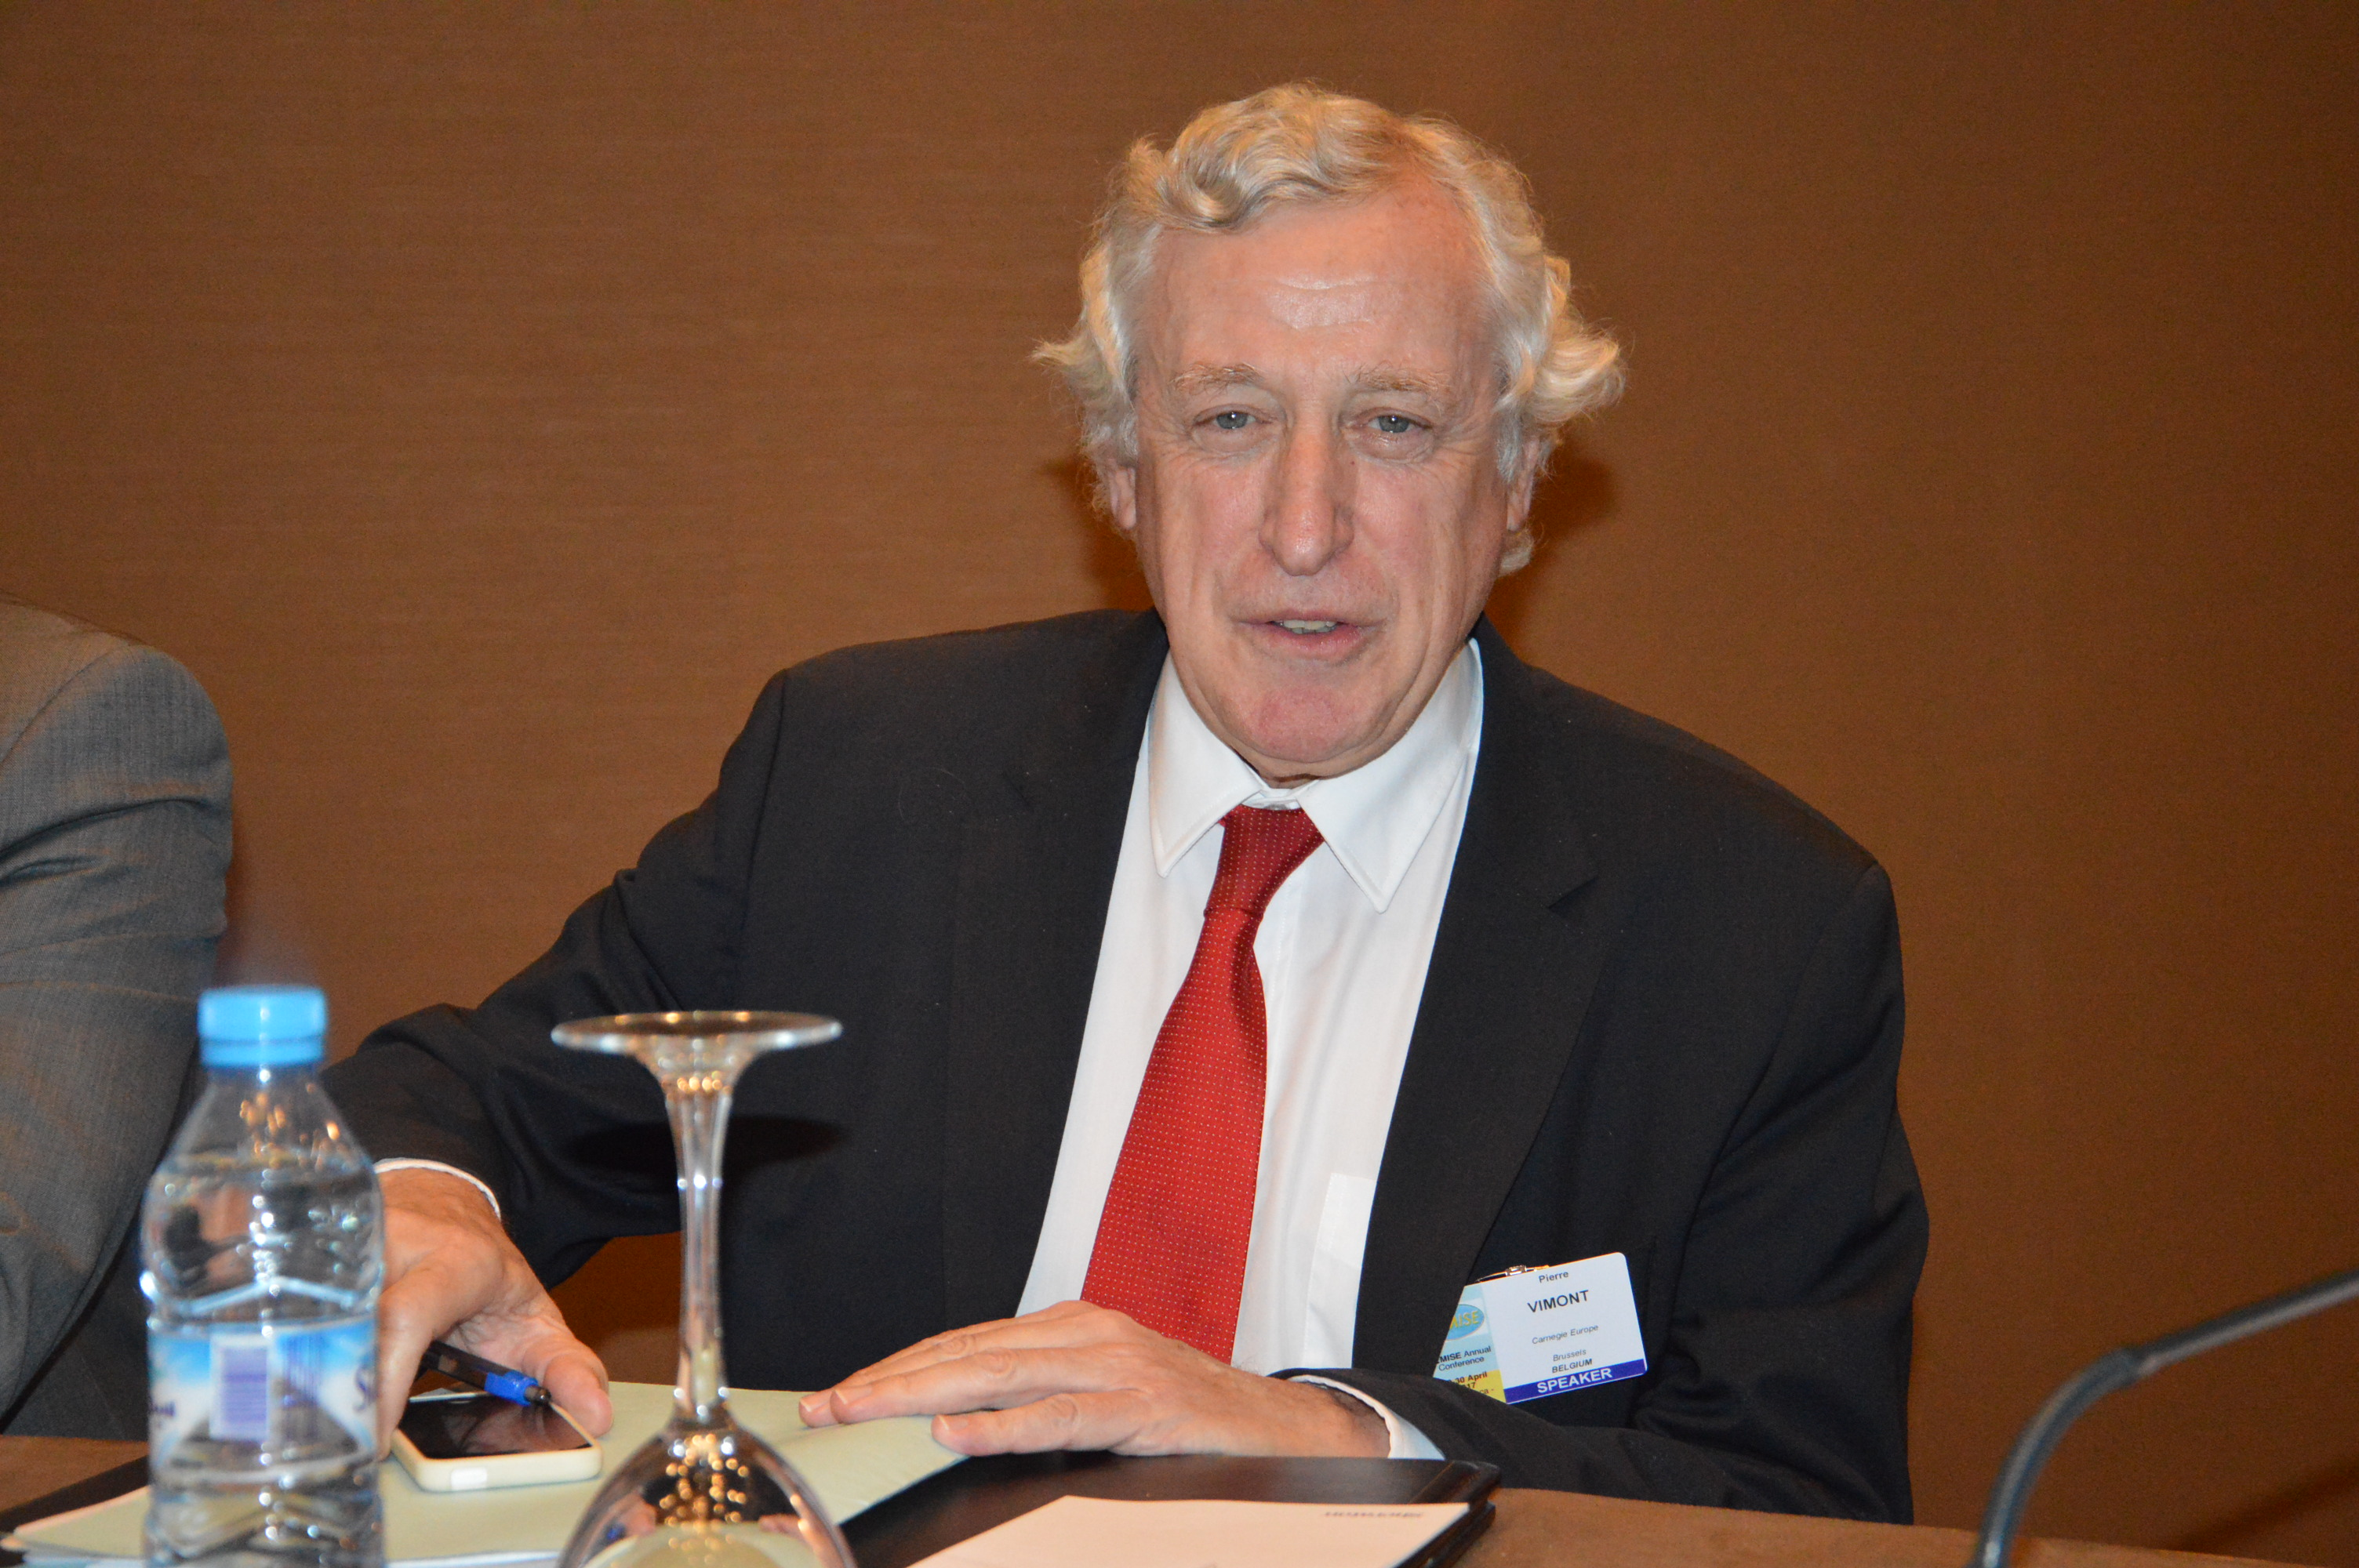 Pierre Vimont, FEMISE conference 2017